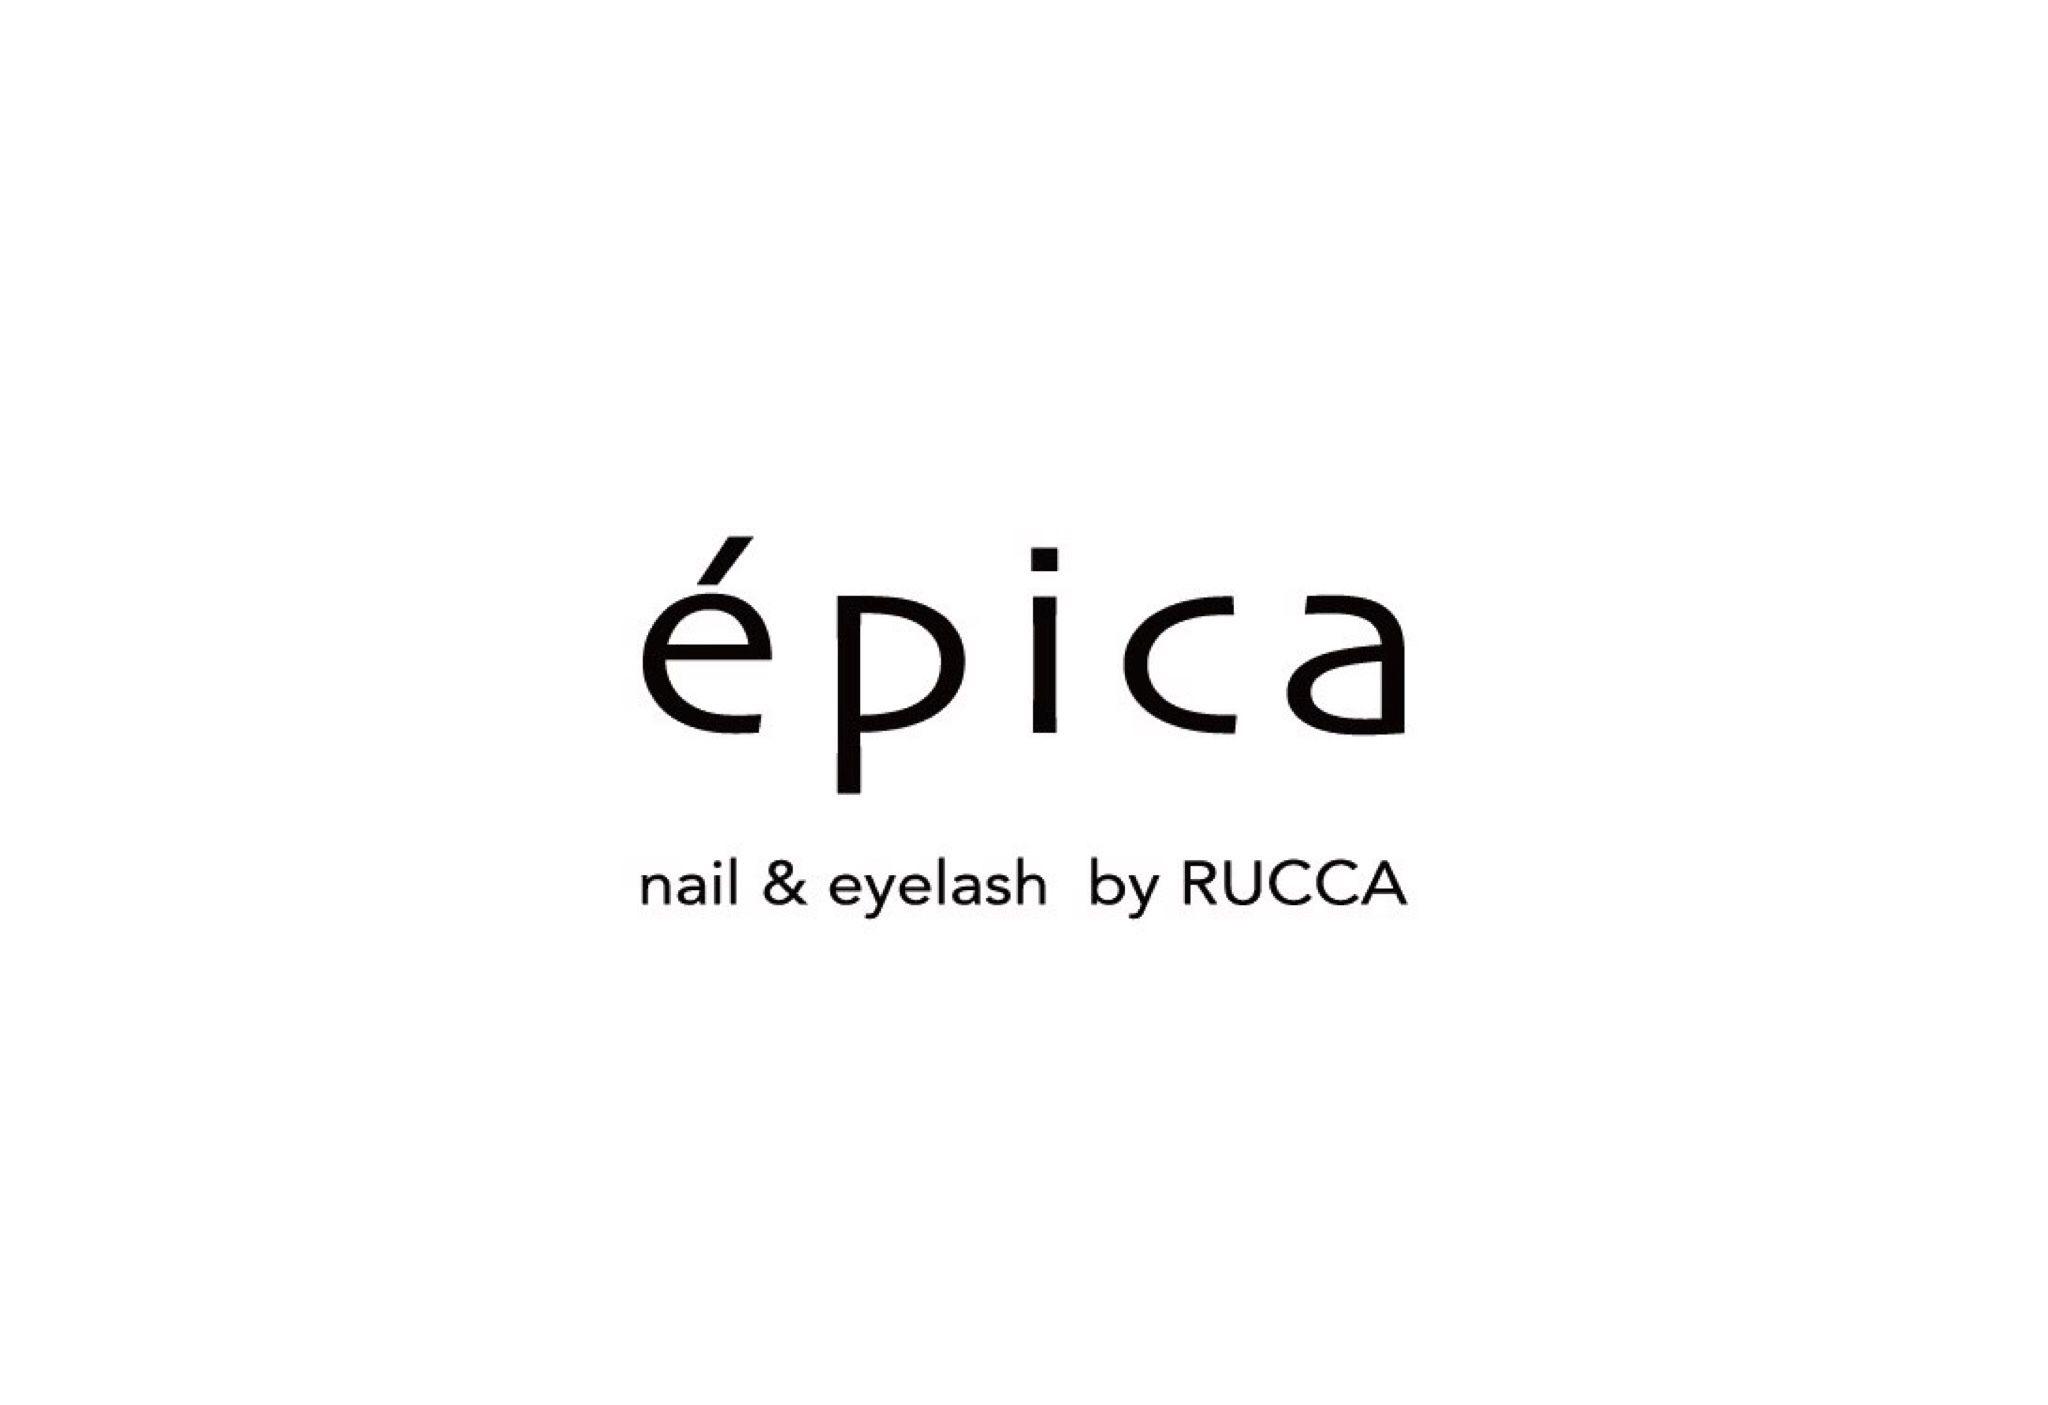 épica by rucca